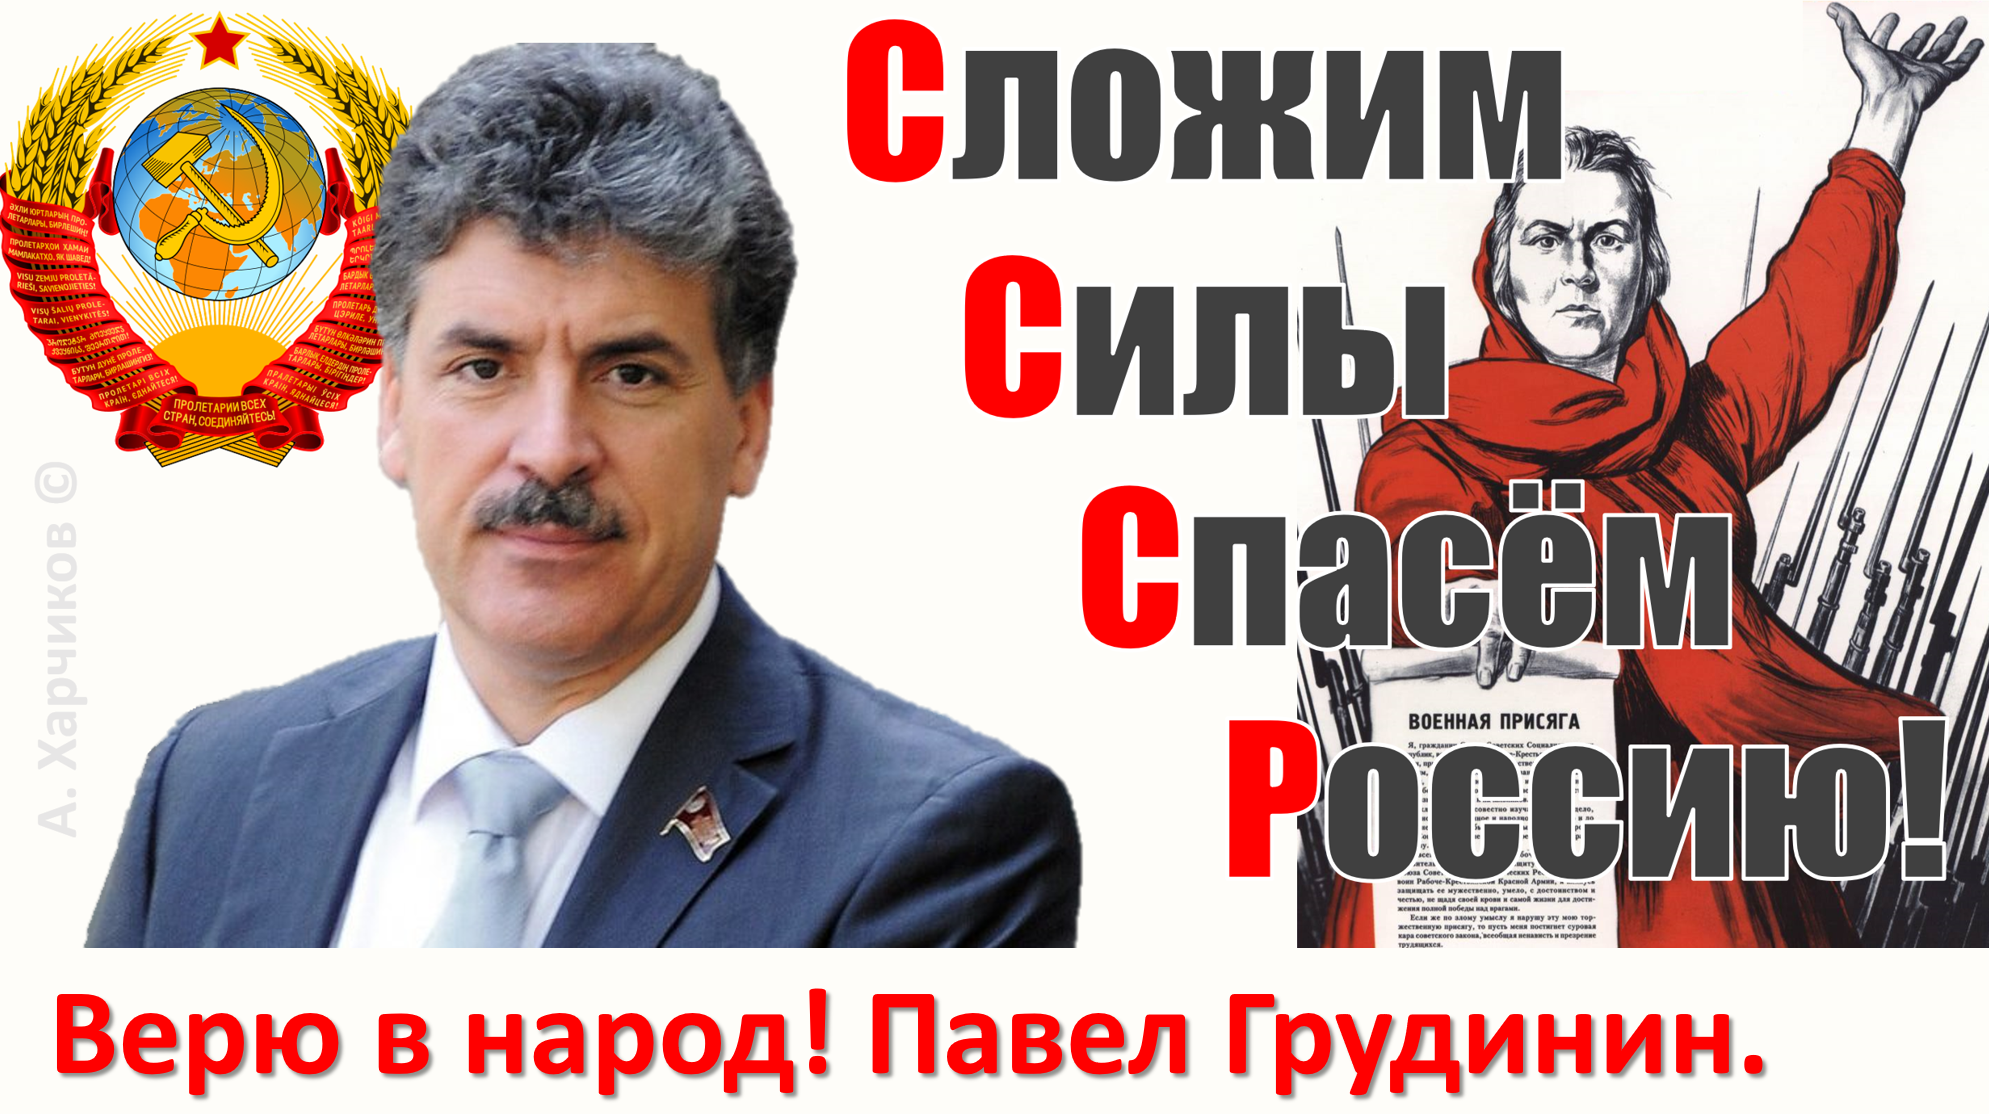 https://images.vfl.ru/ii/1520930527/157d38bb/20937600.png